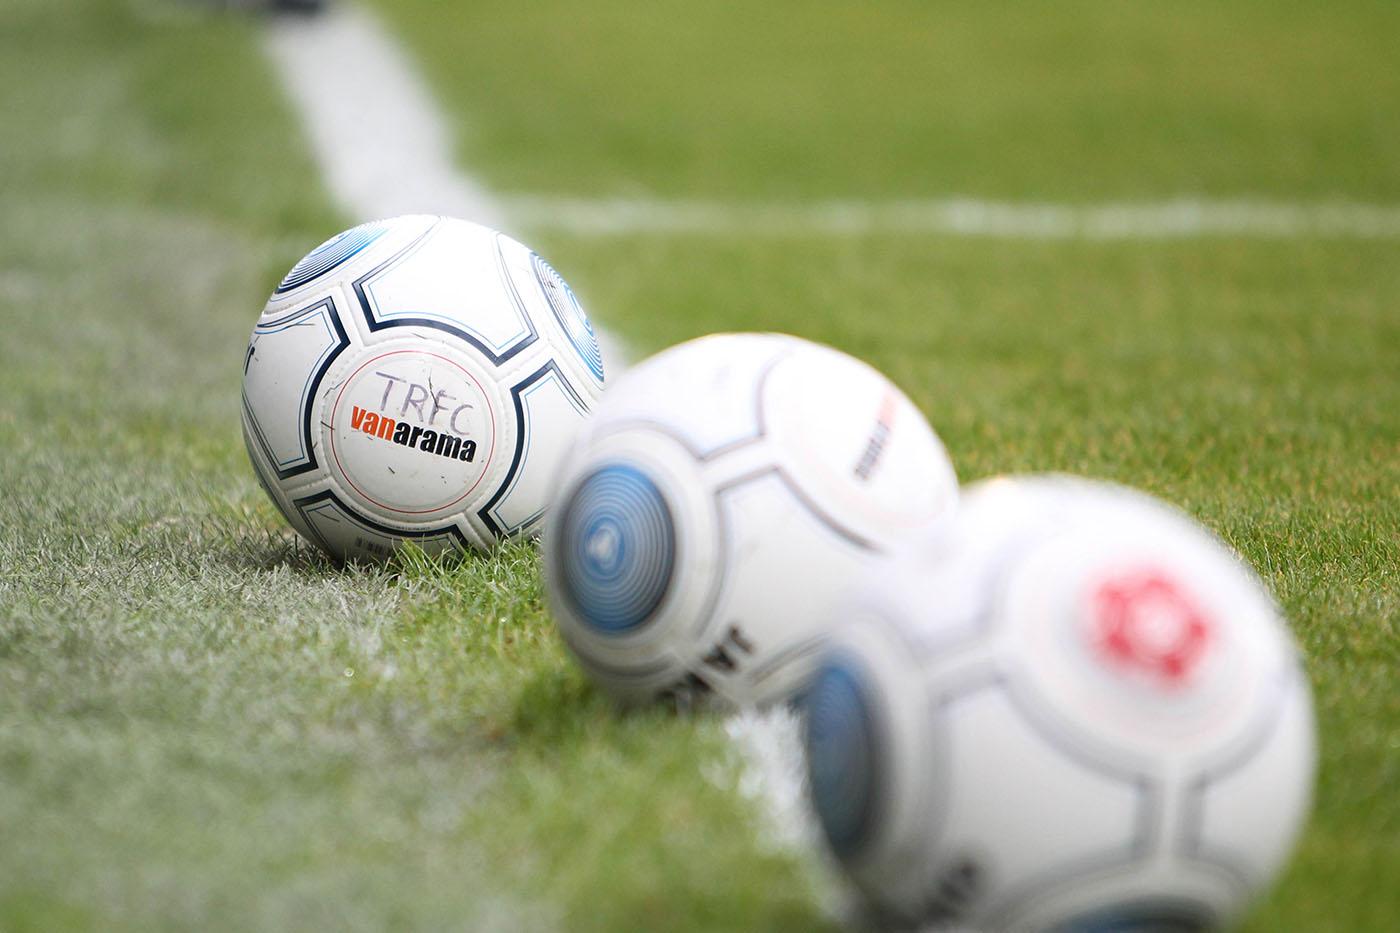 www.thenonleaguefootballpaper.com